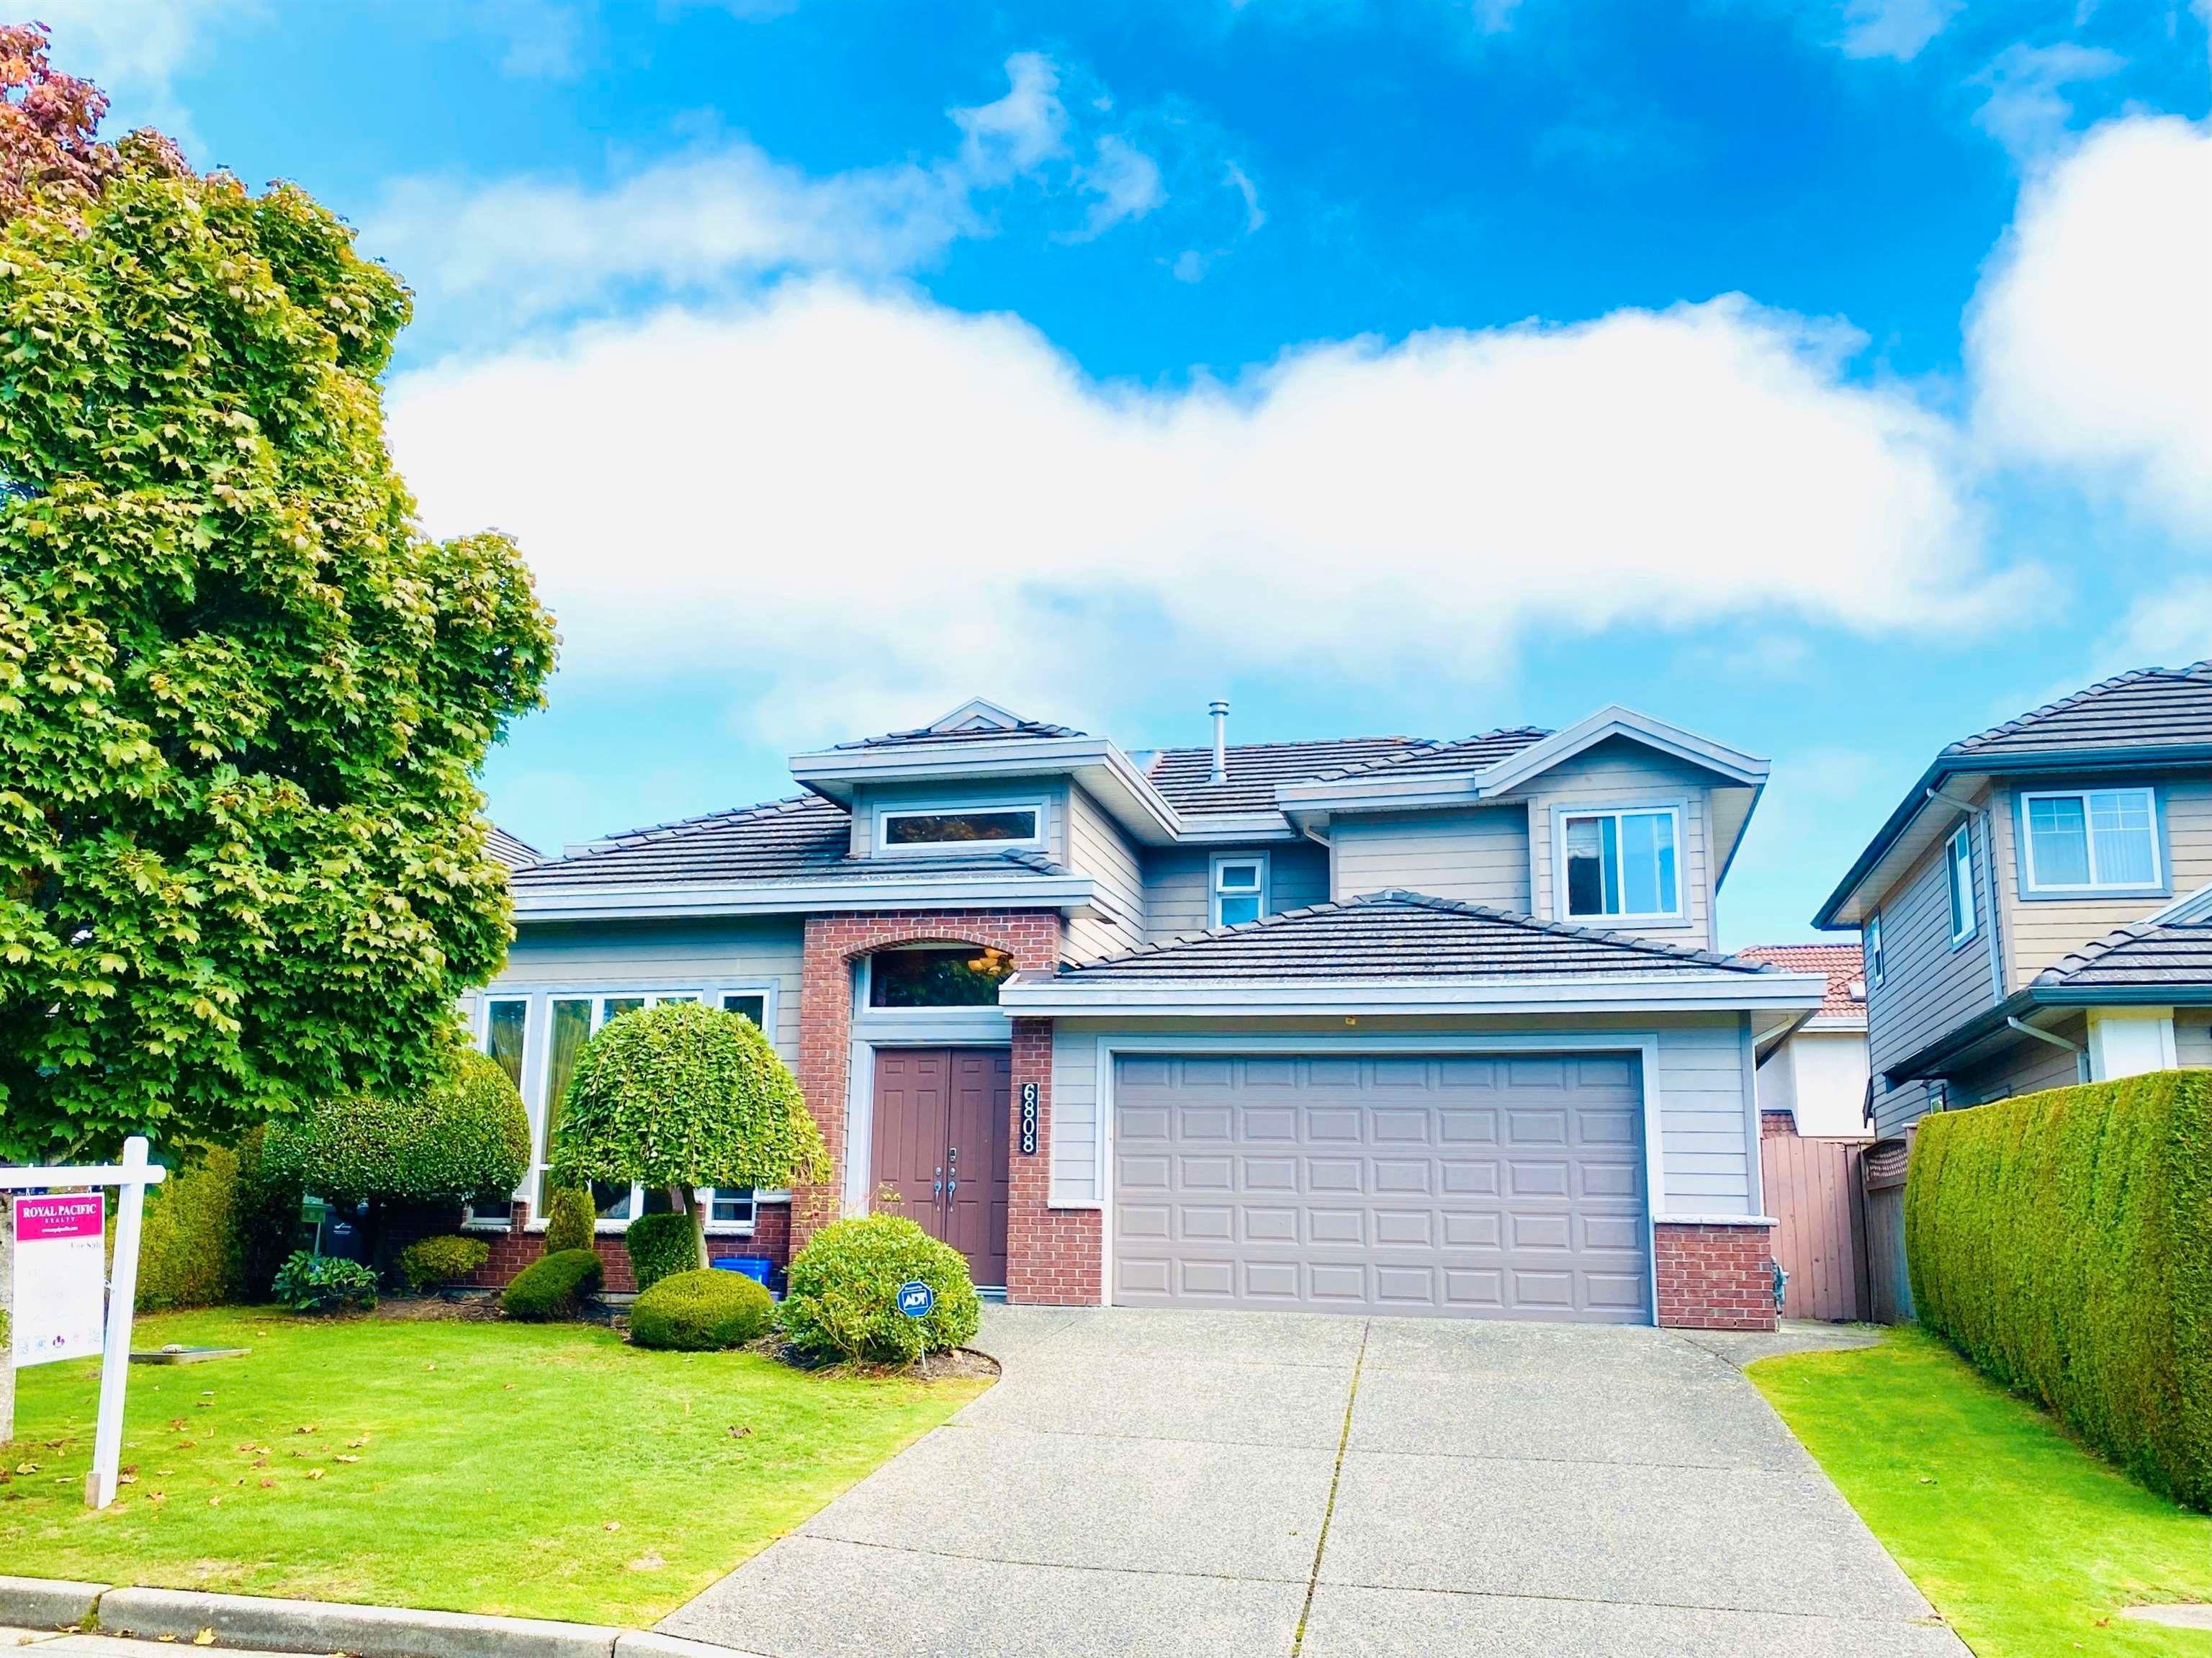 Main Photo: 6808 HAMBER Street in Richmond: Terra Nova House for sale : MLS®# R2607641